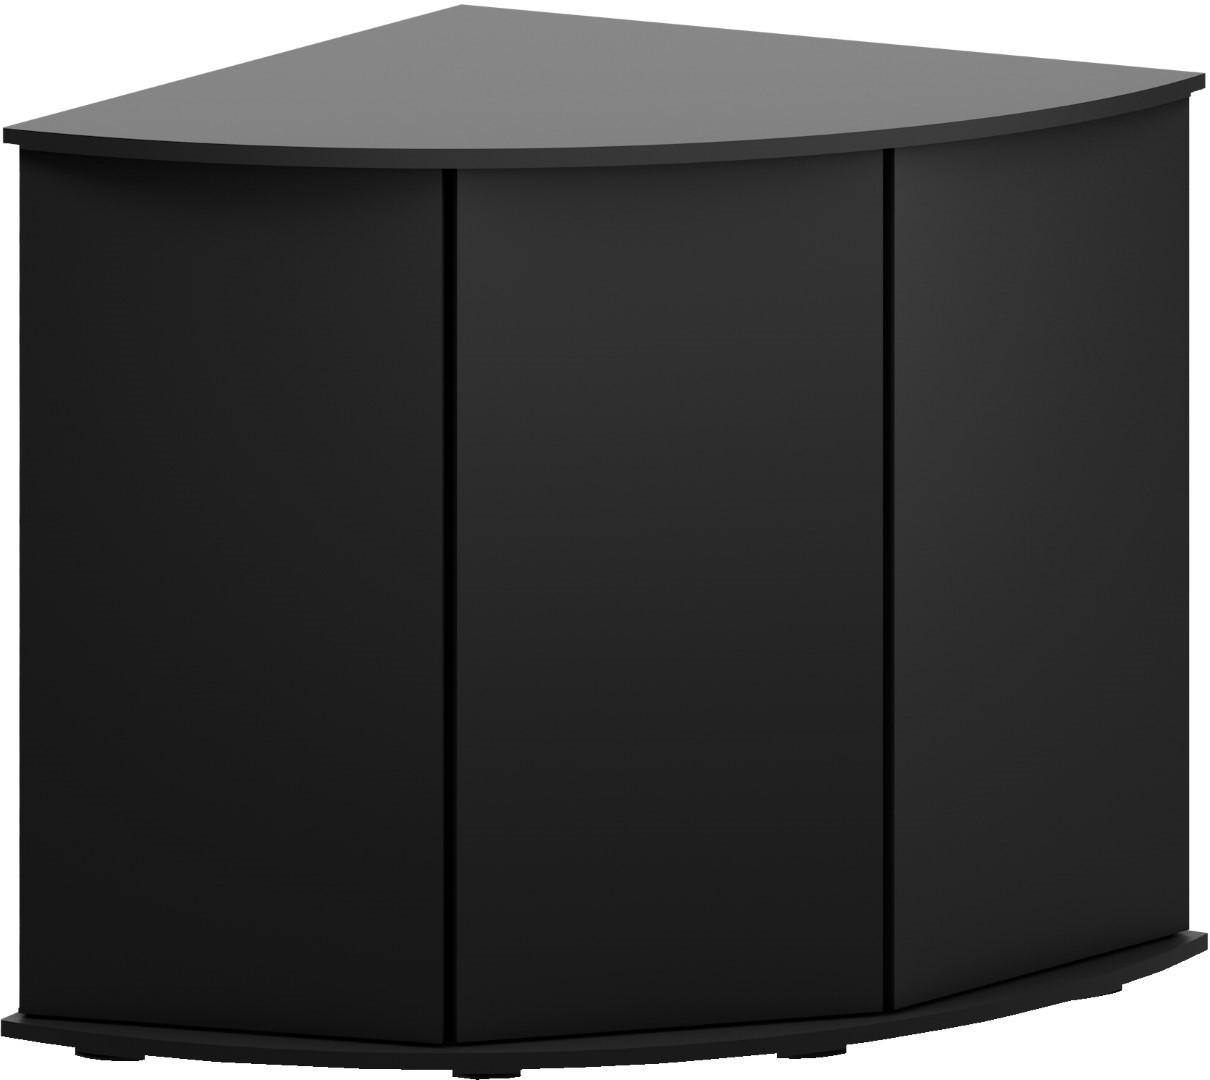 Juwel meubel bouwpakket SBX Trigon 190 zwart